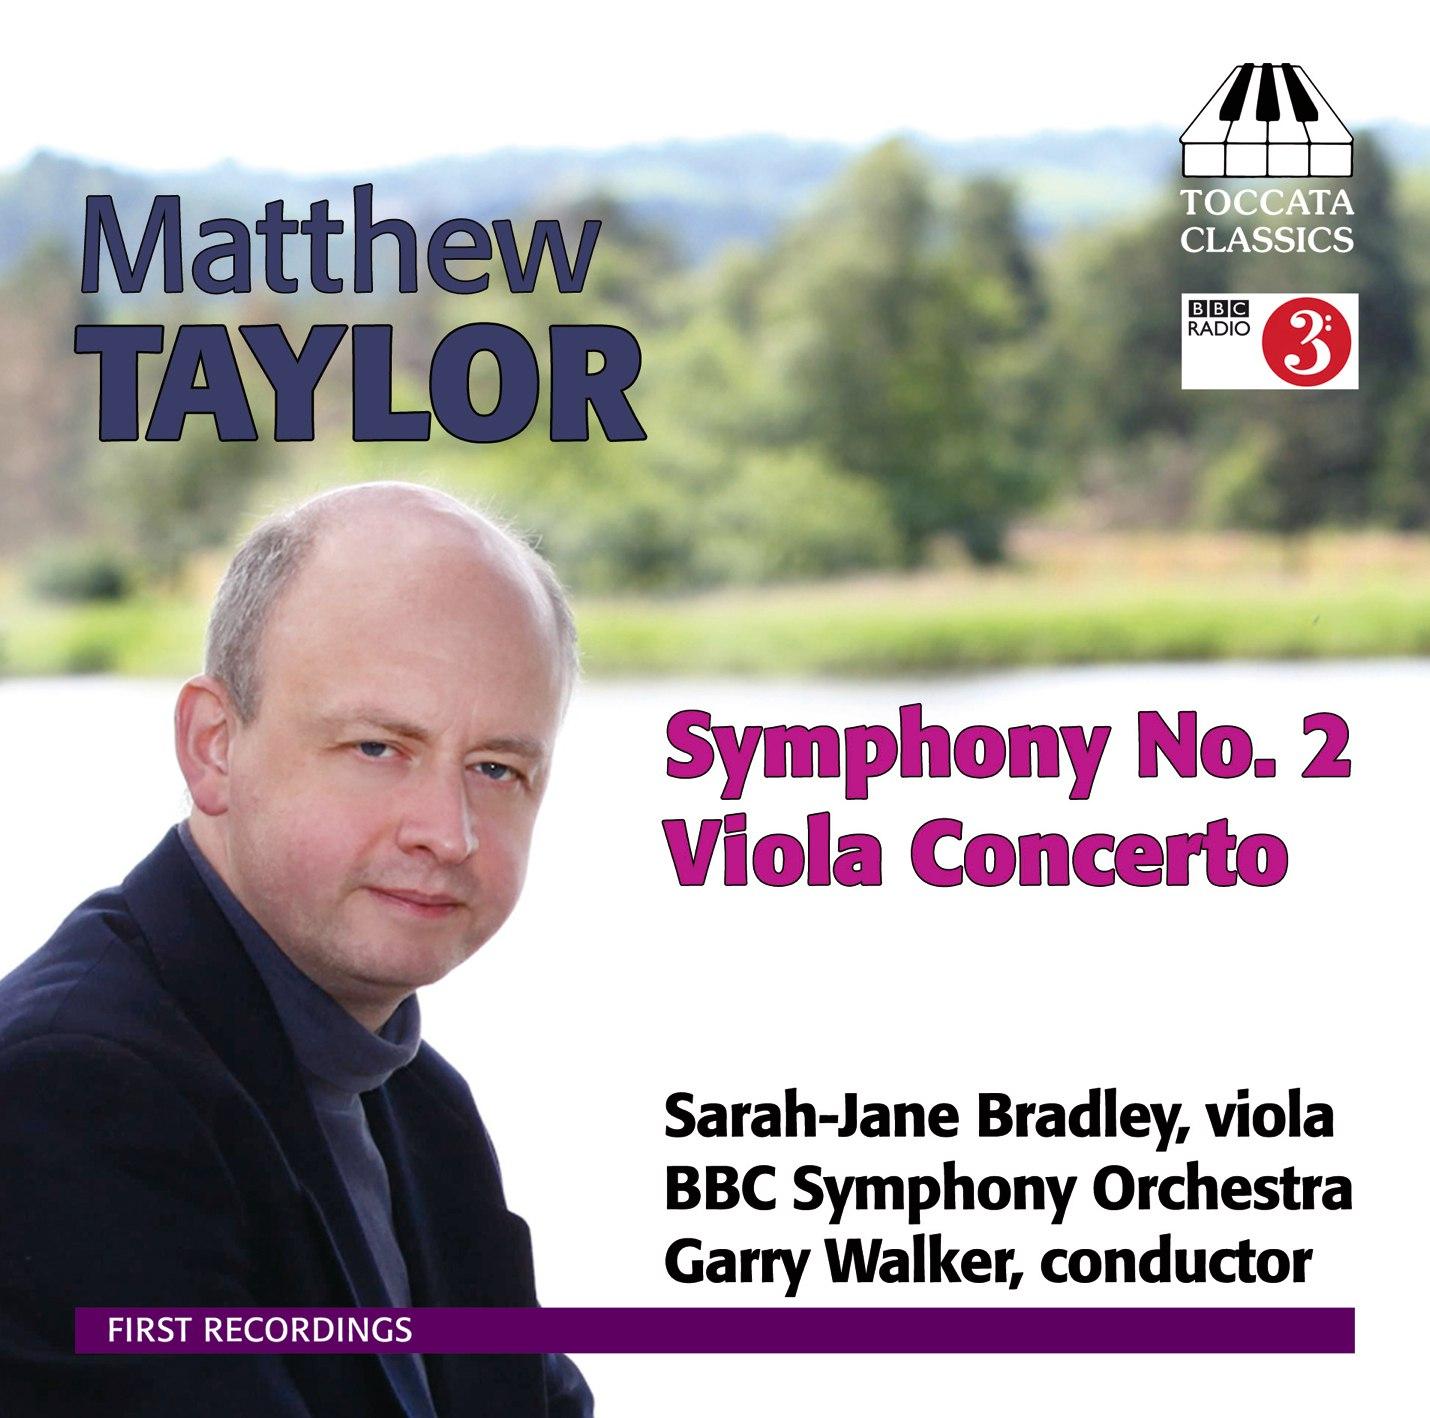 Matthew Taylor: Symphony No. 2